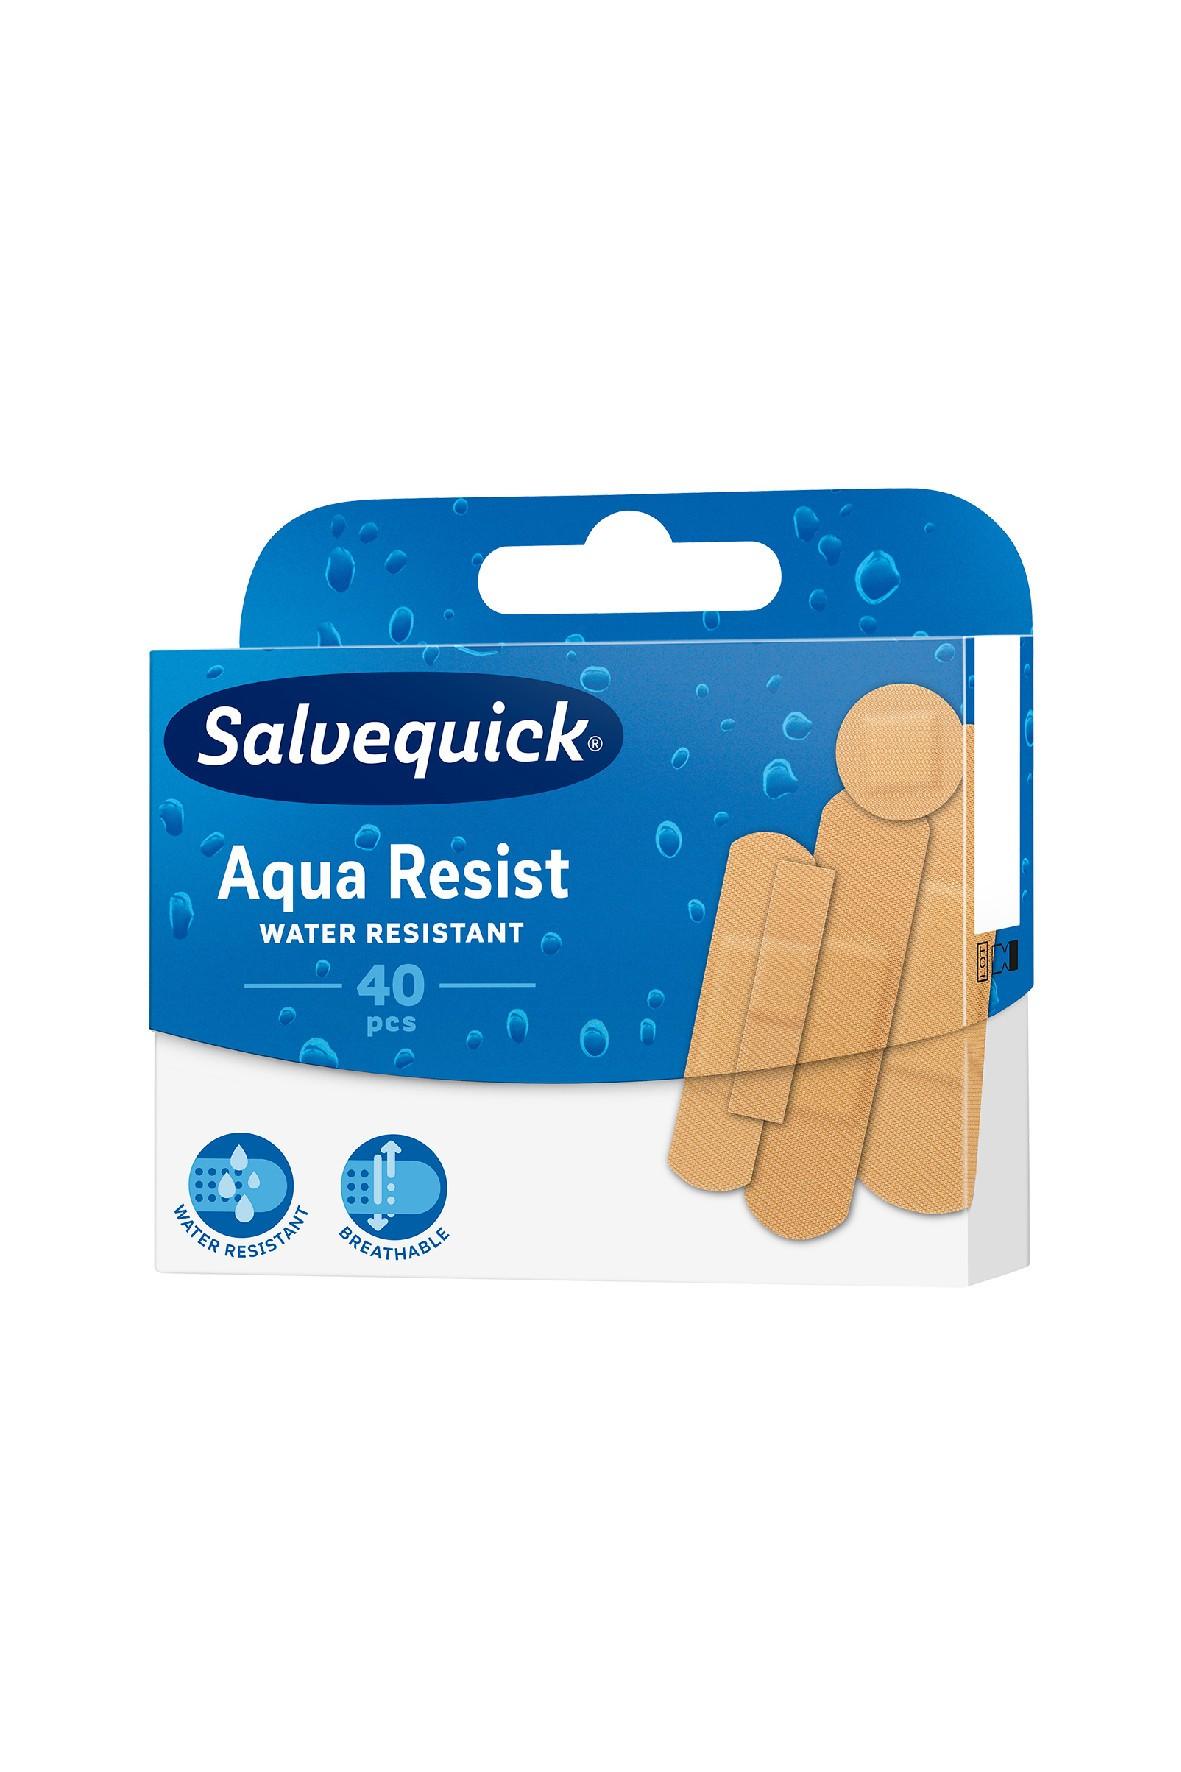 Salvequick Aqua Resist plastry 40 szt.